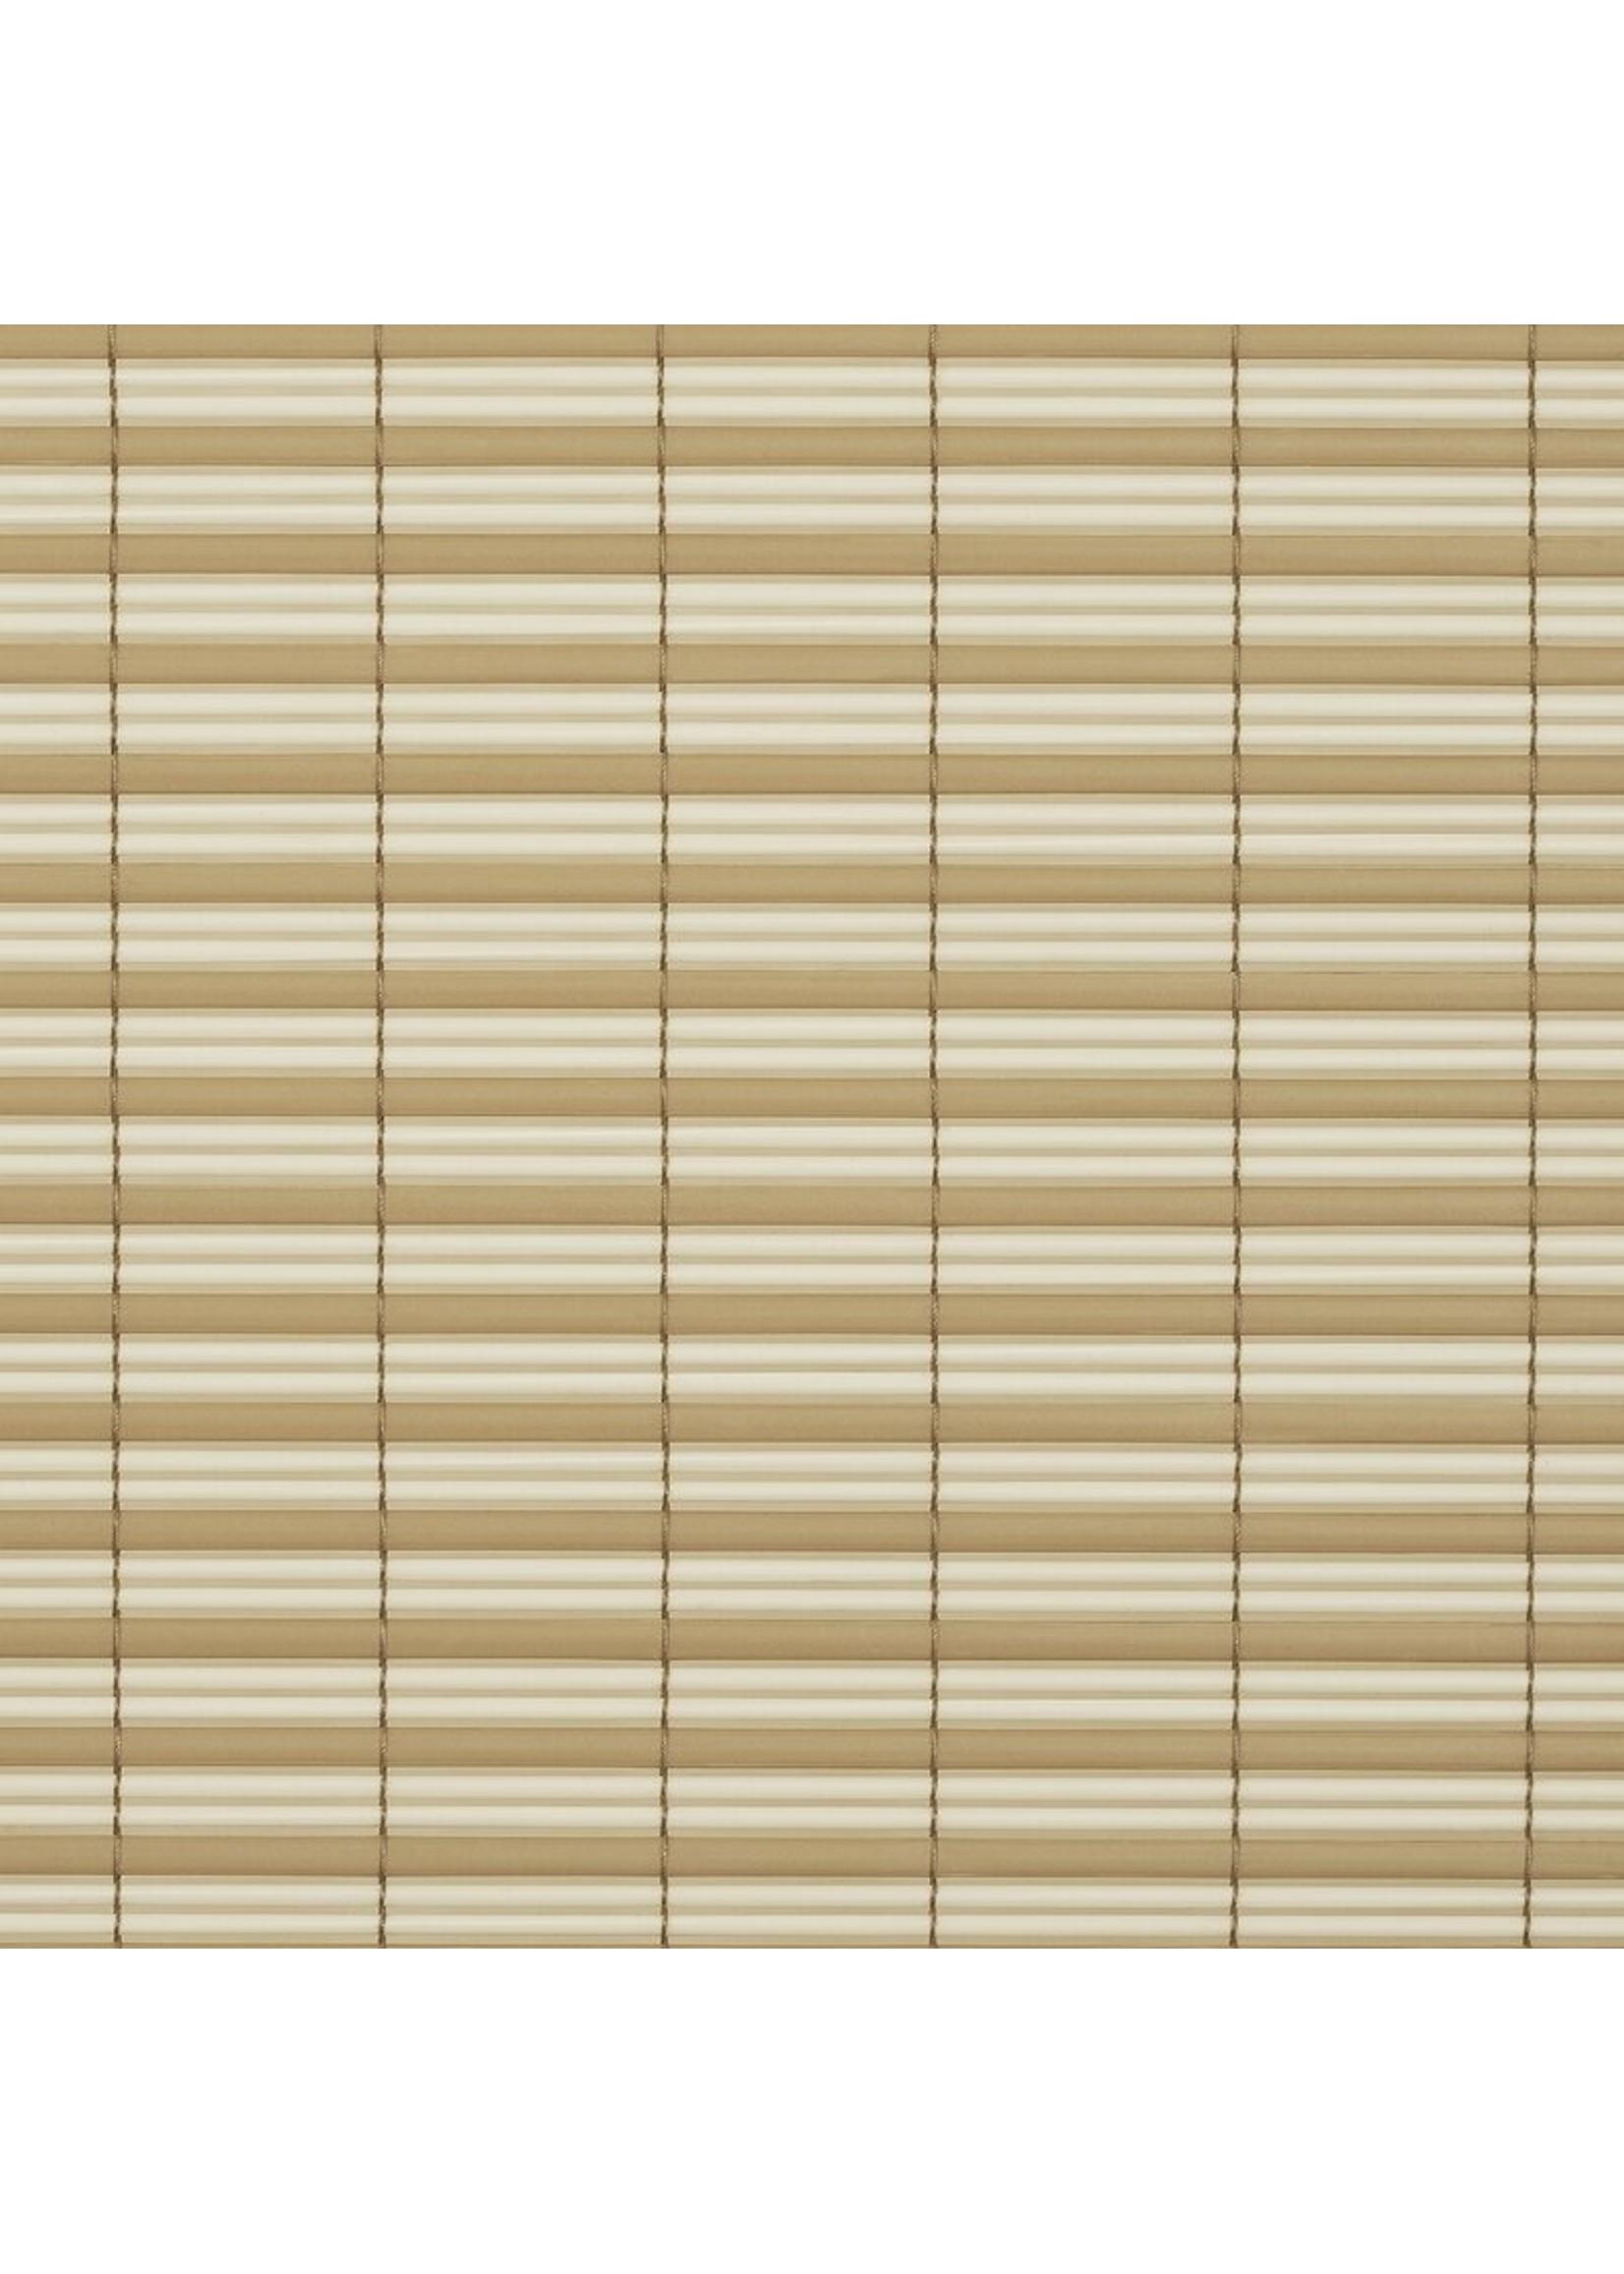 "*72"" x 72"" - Veranda Vinyl Semi-Sheer Roll-Up Shade - Desert/Almond - Final Sale"